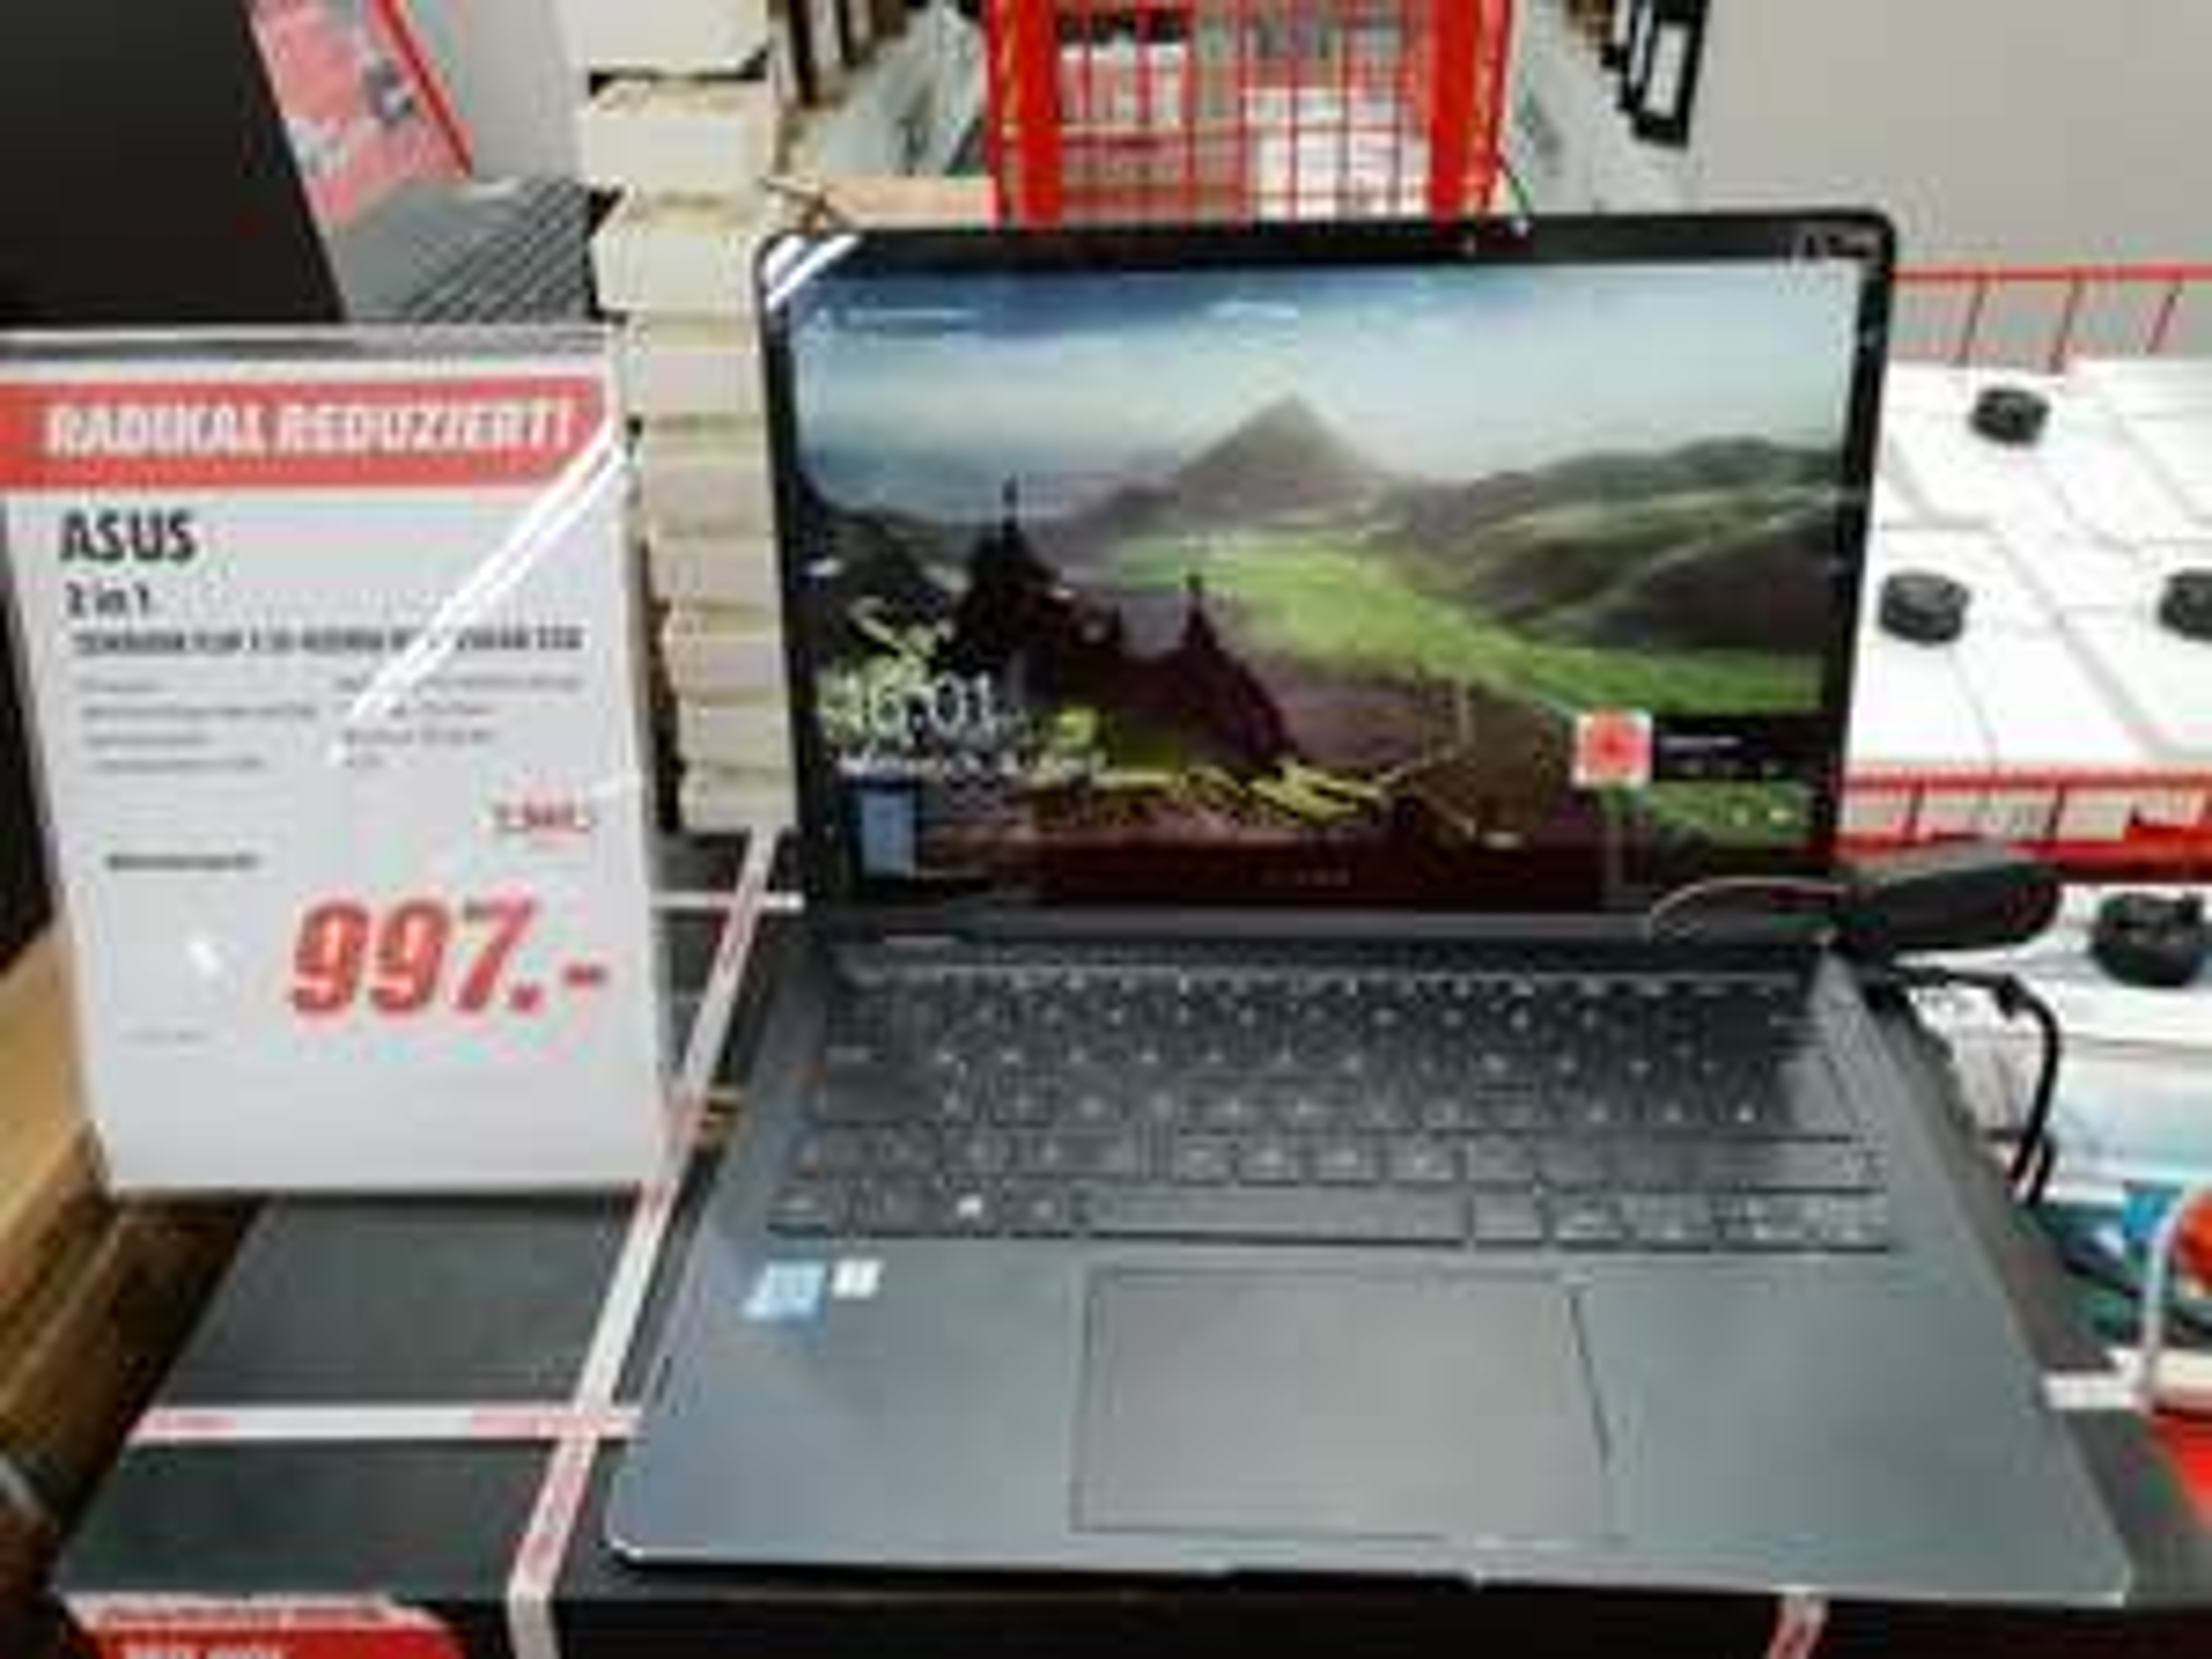 LOKAL BONN ASUS Zenbook Flip S UX370UA-C4207T Convertible 256 GB 13.3 Zoll - Mediamarkt Bonn